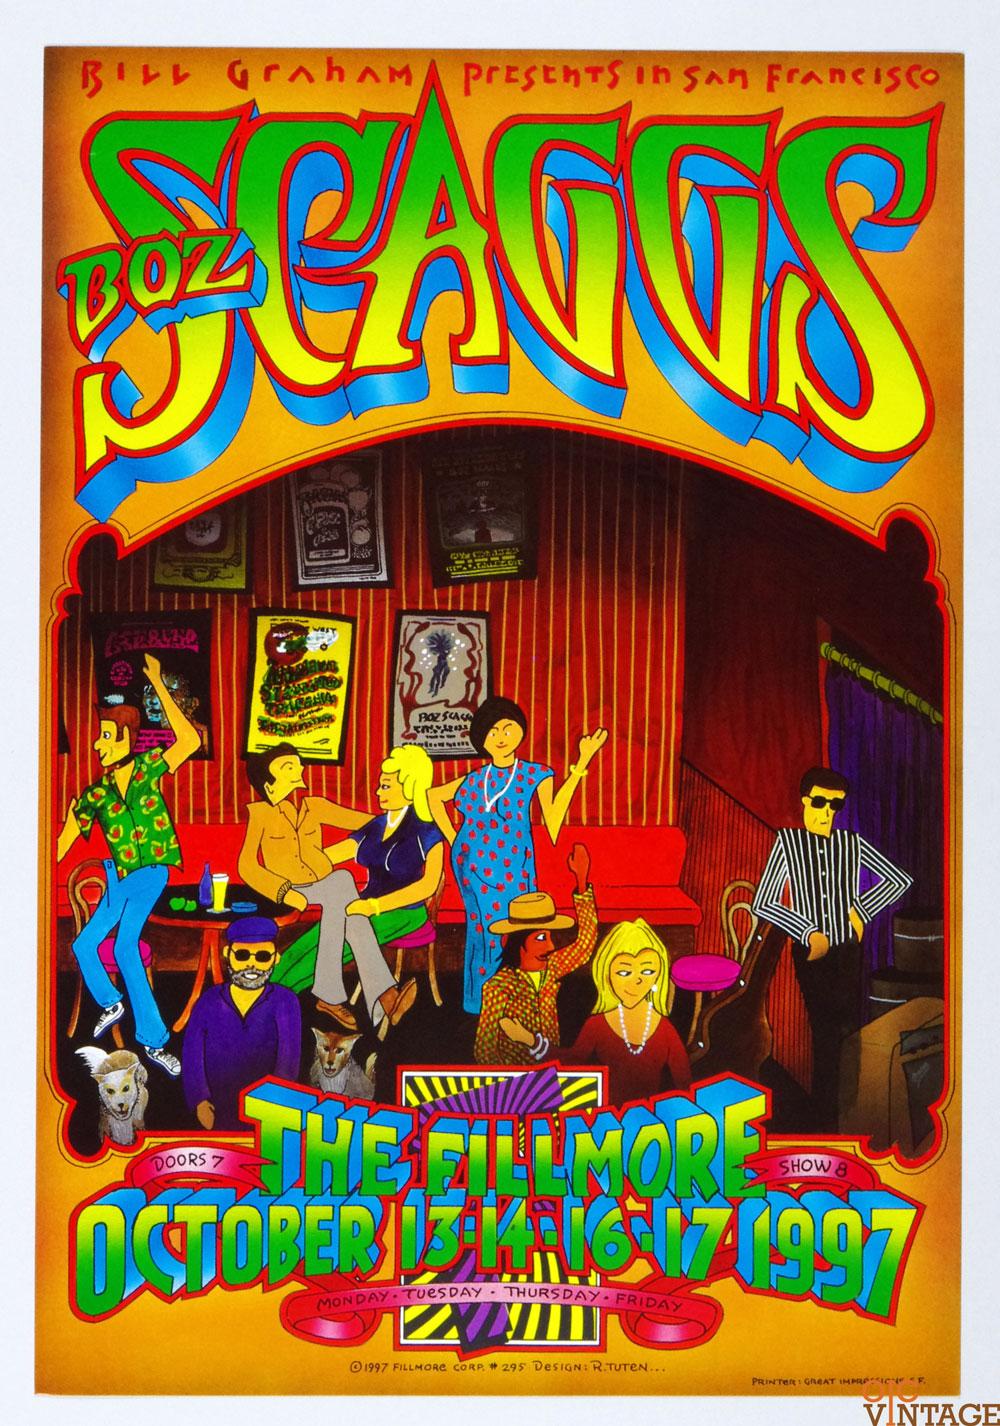 Boz Scaggs Poster 1997 Oct 13 New Fillmore